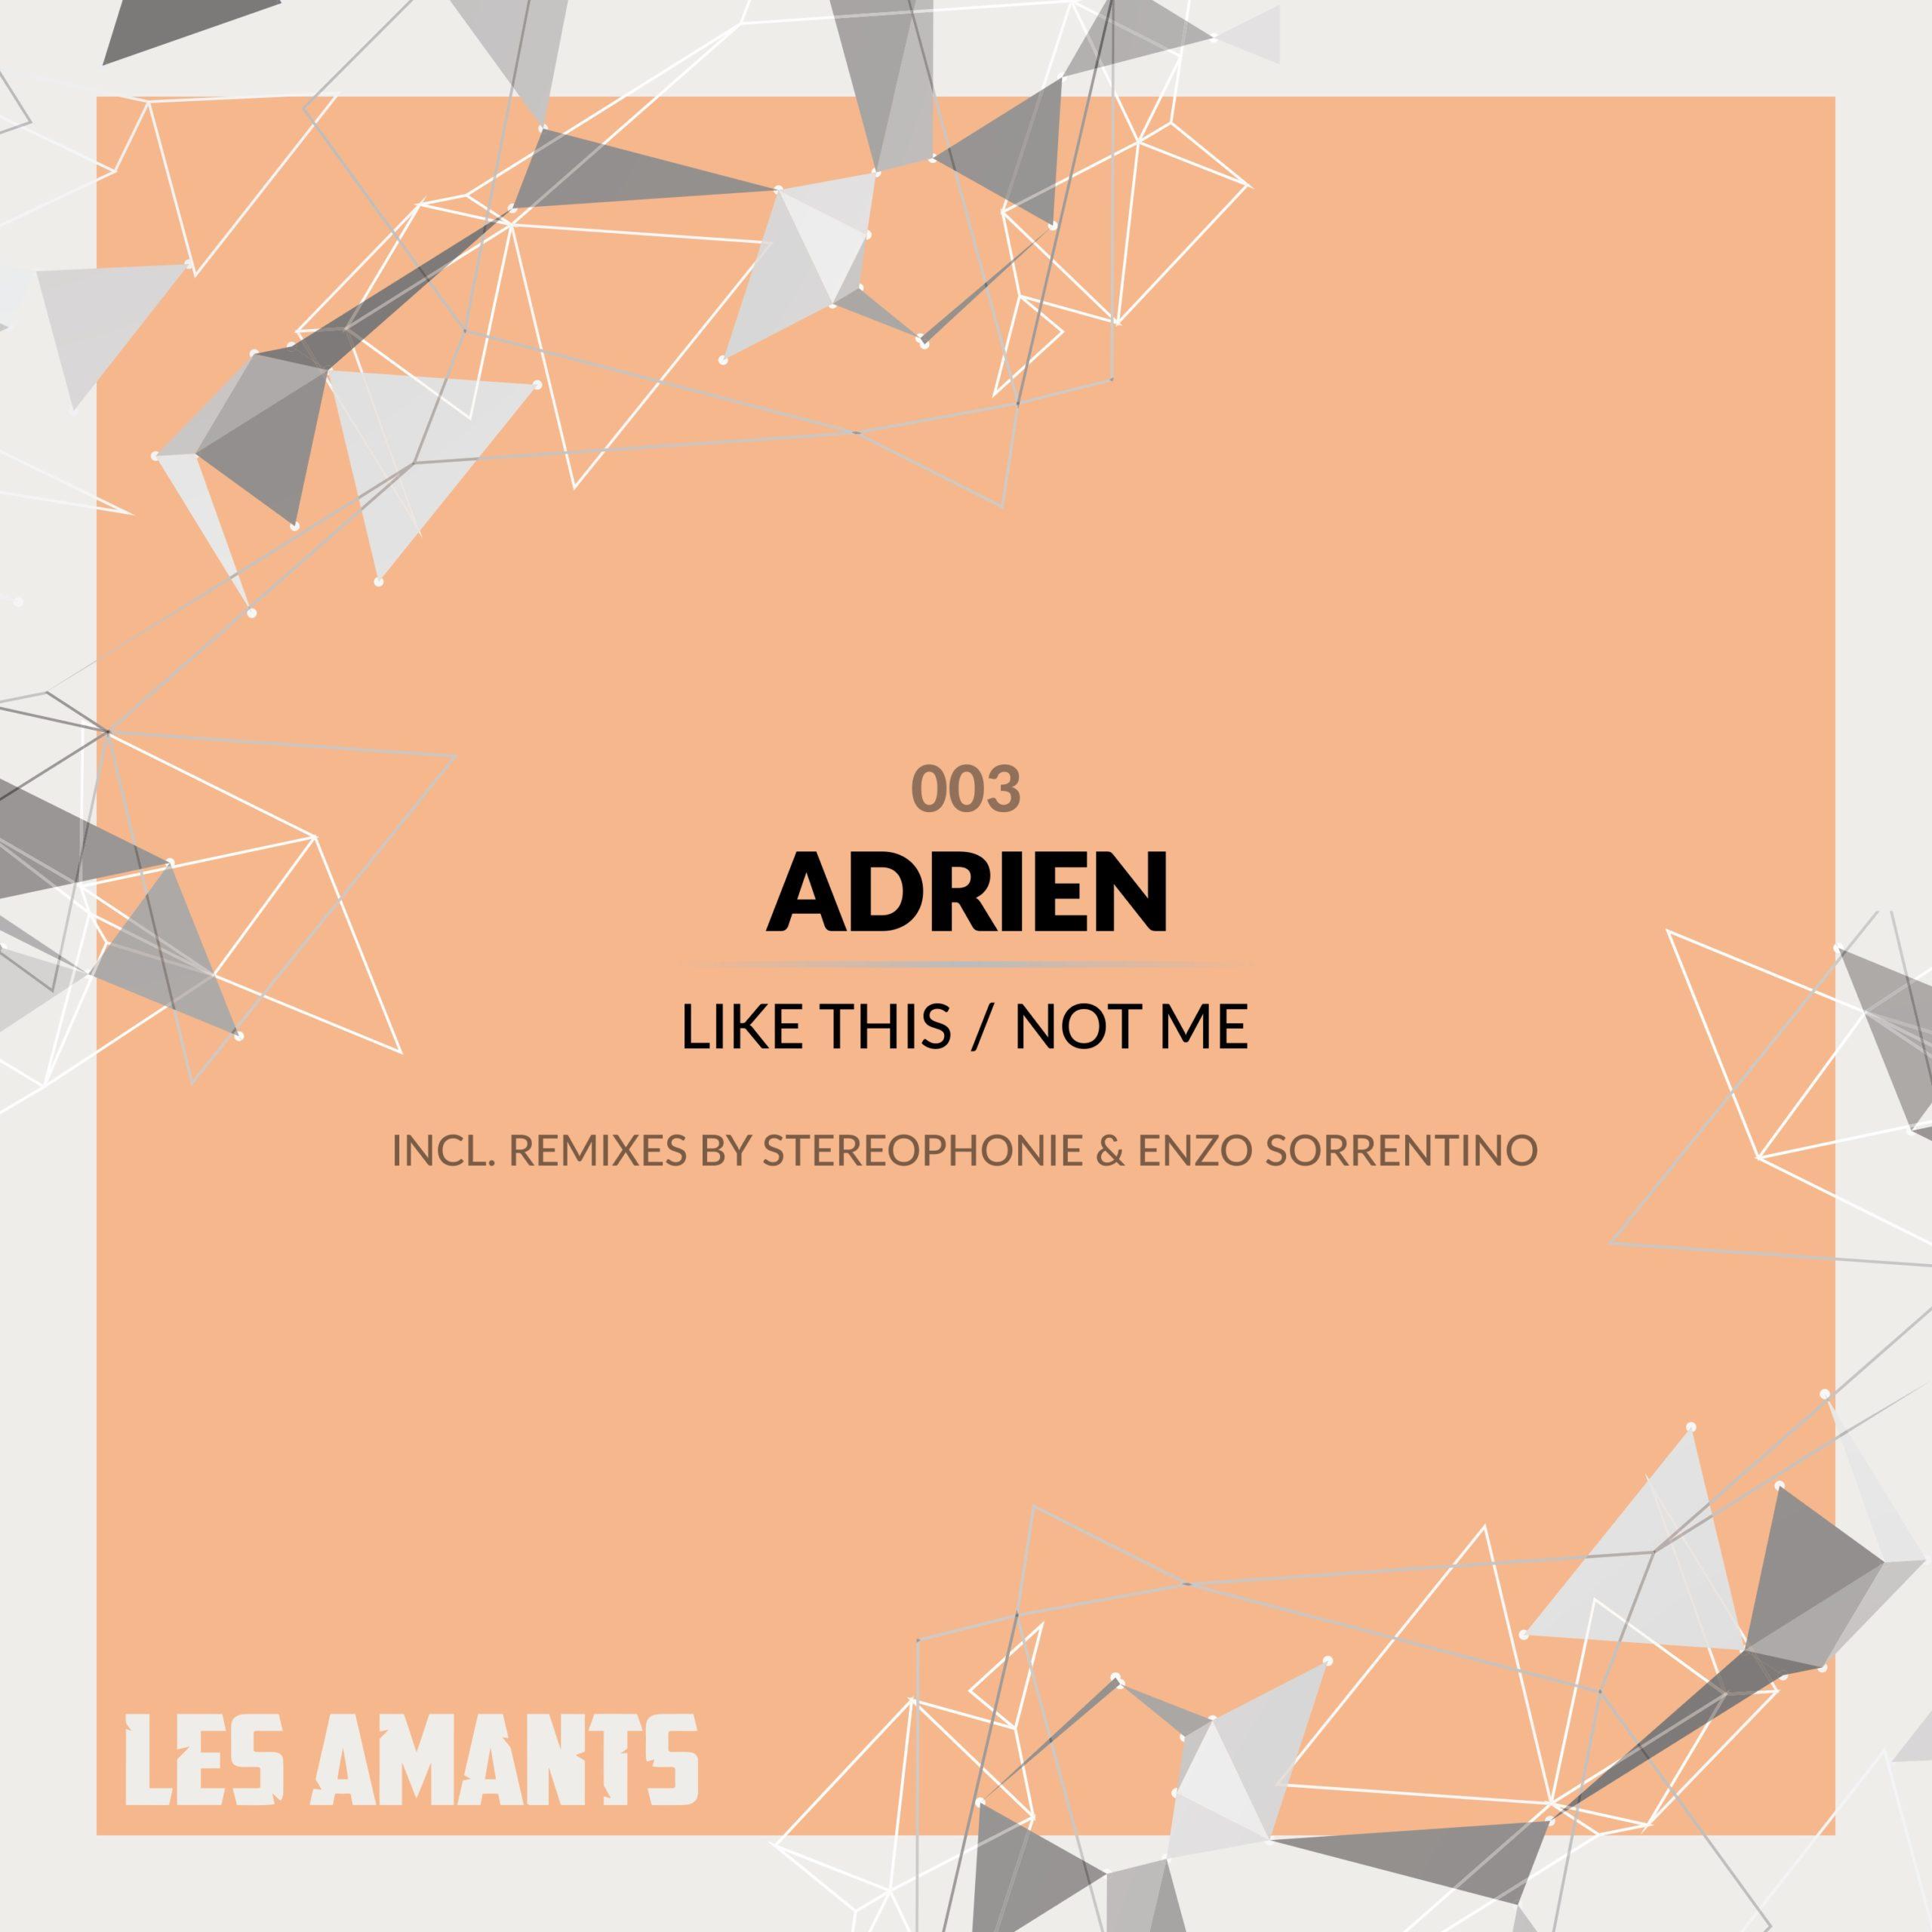 la003 adrien - like this-not me